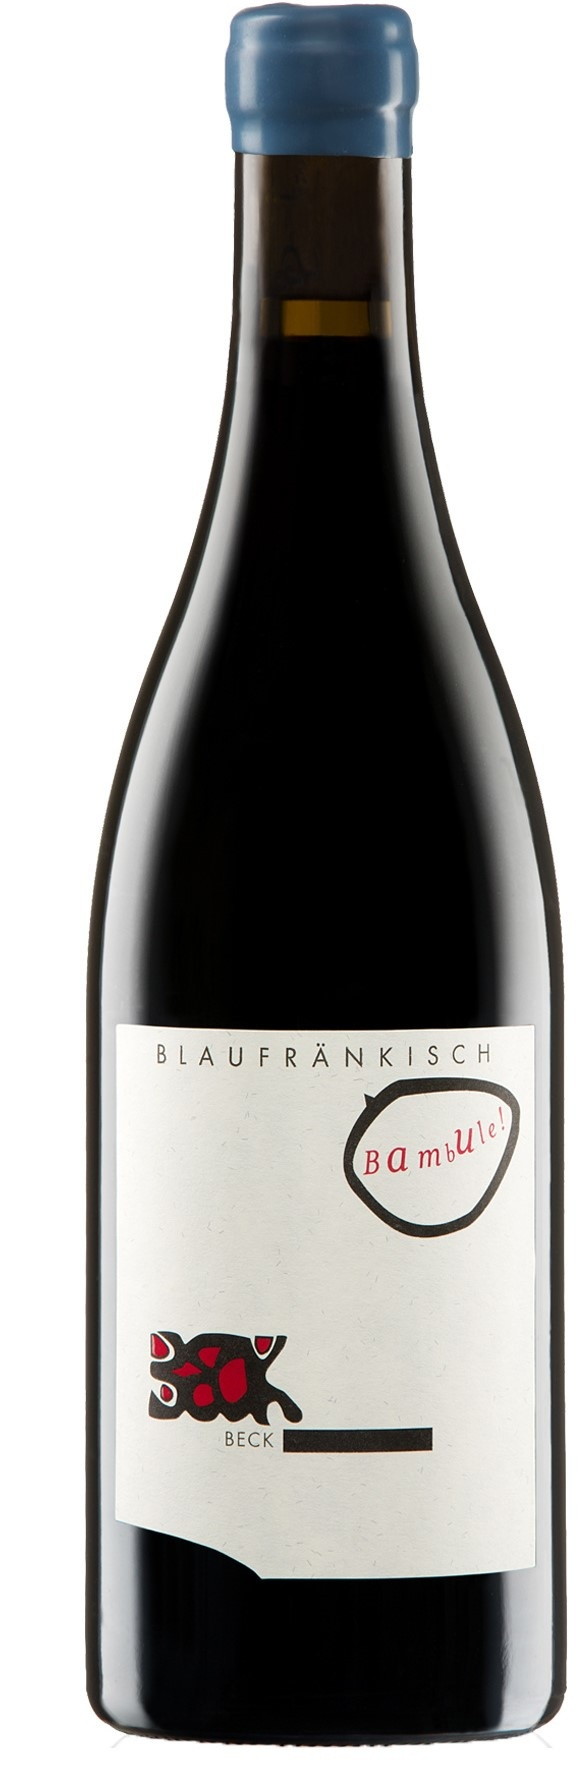 Weingut Beck Blaufränkisch, Bambule! 2017-1